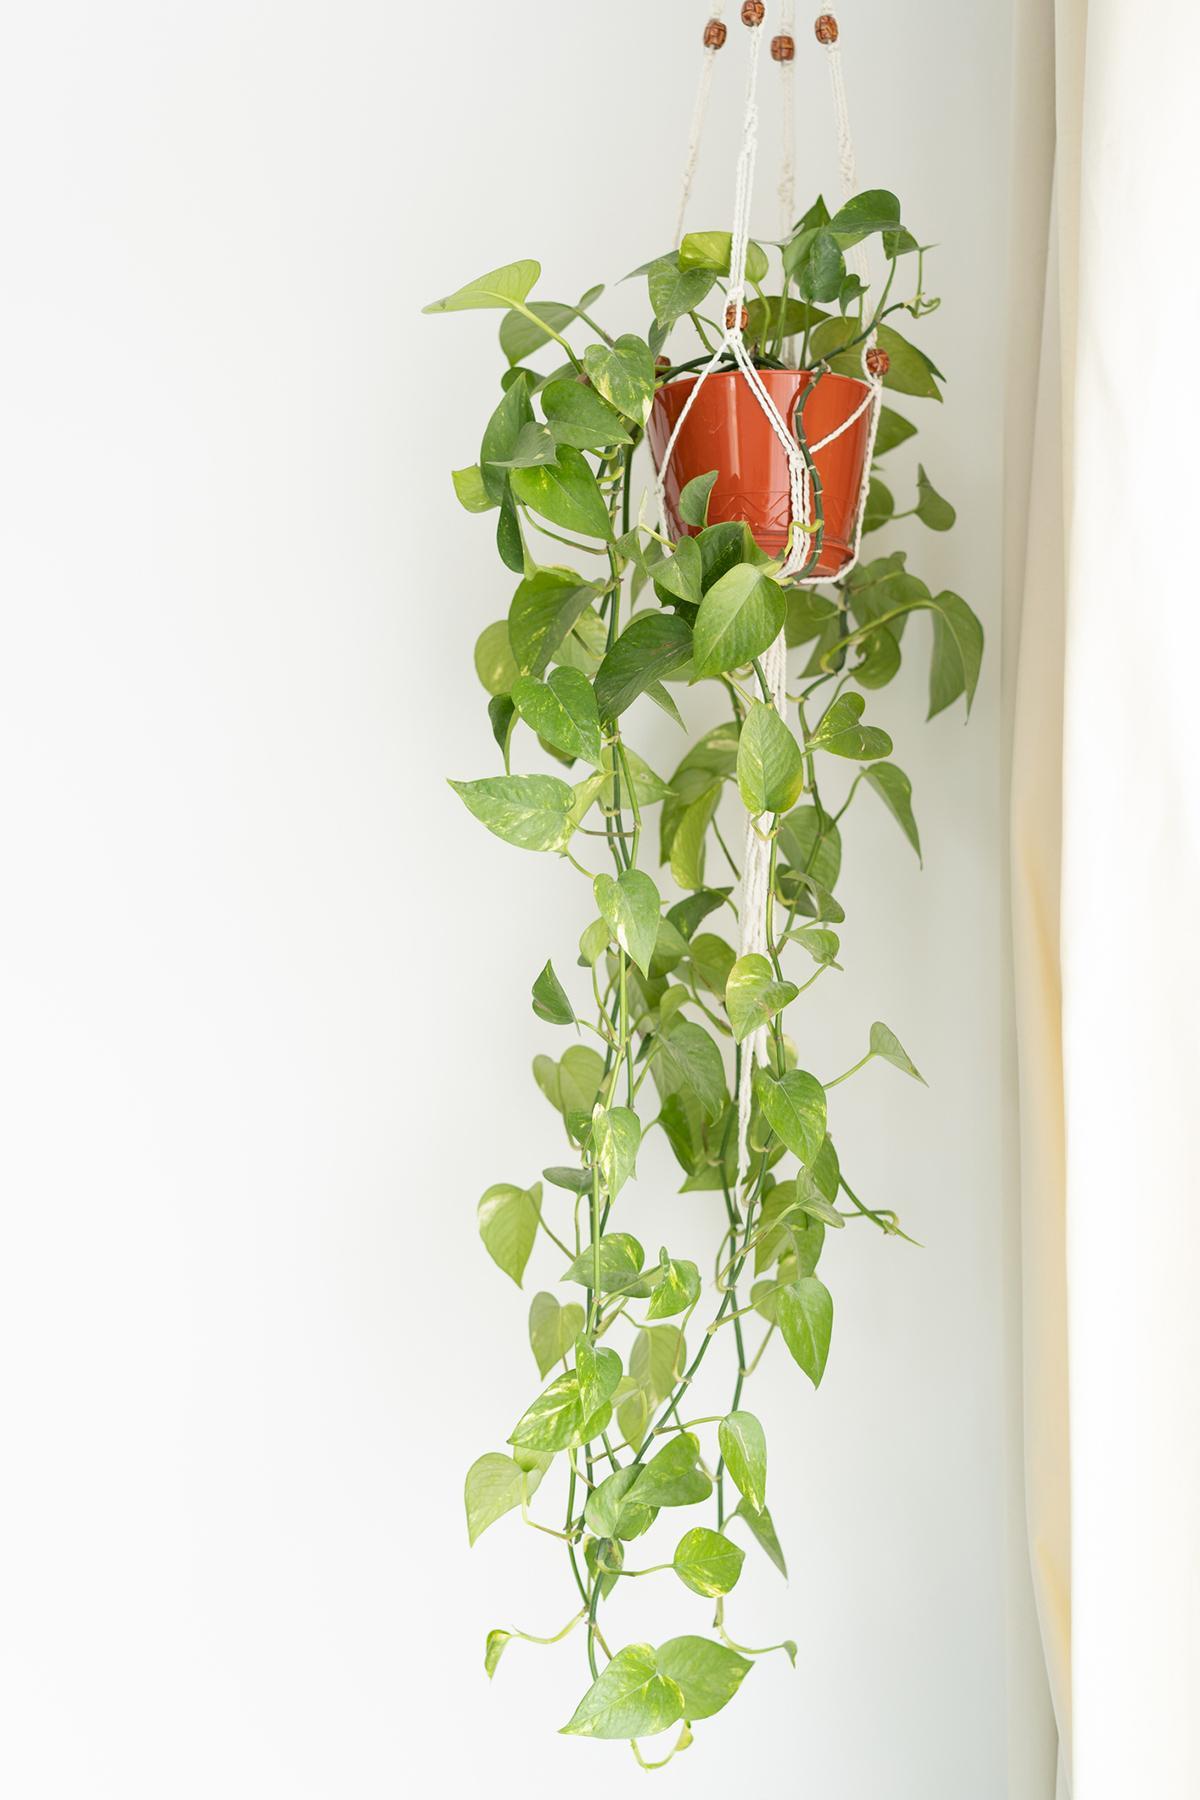 pothos-houseplant-indoors-1580934784552.jpg